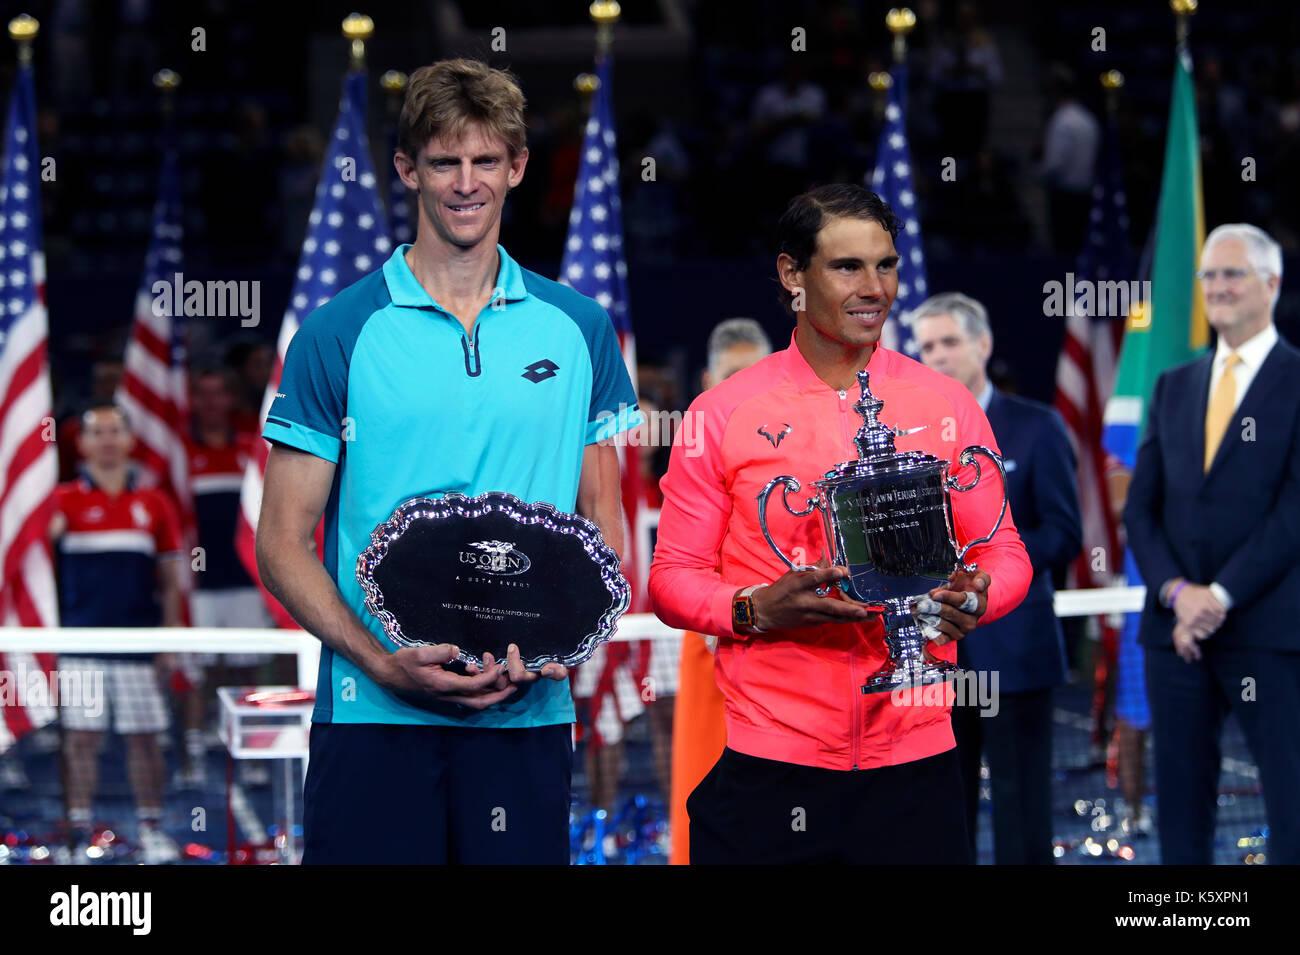 New York, United States. 10th Sep, 2017. US Open Tennis: New York, 10 September, 2017 - Rafael Nadal of Spain holds - Stock Image